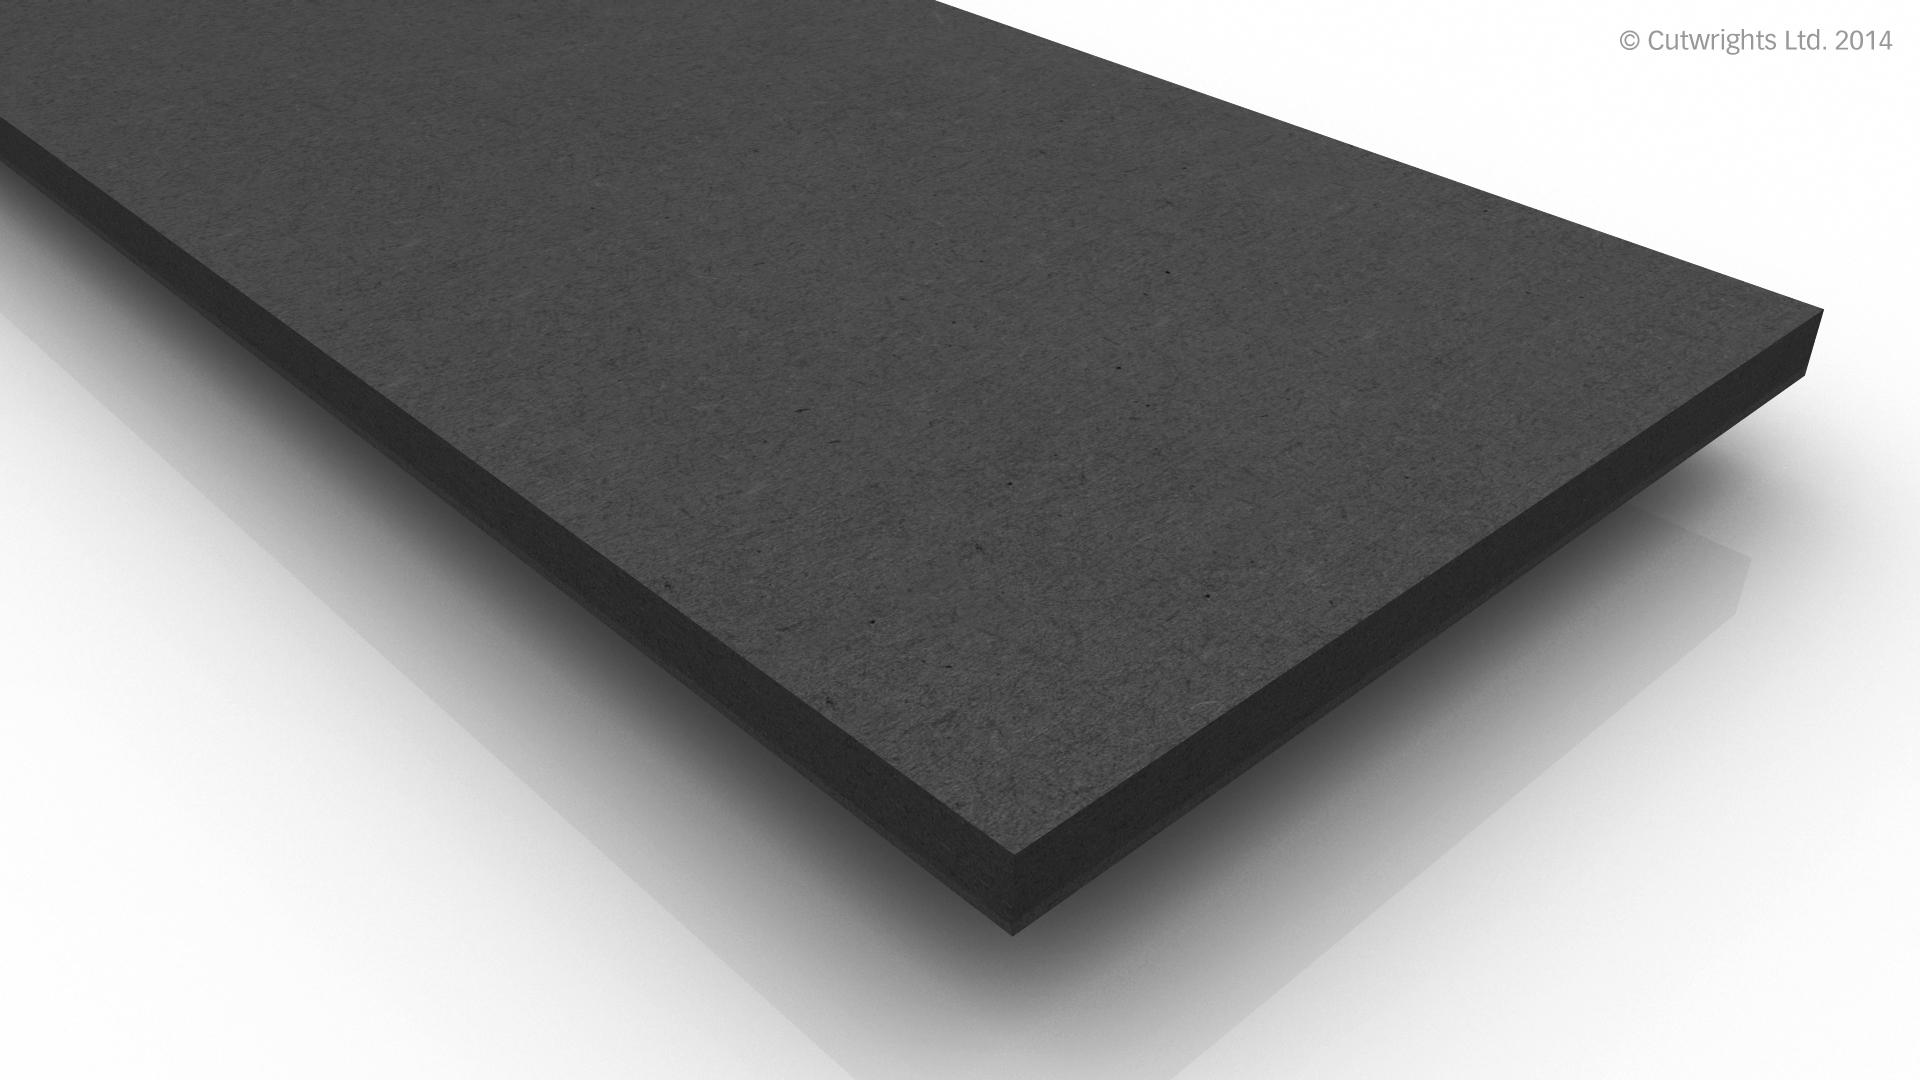 24 x 24 Board Size, 3//4 Board Thickness Valchromat Collection Colored MDF Medium Density Fiberboard Single Square Cut Sheet Black